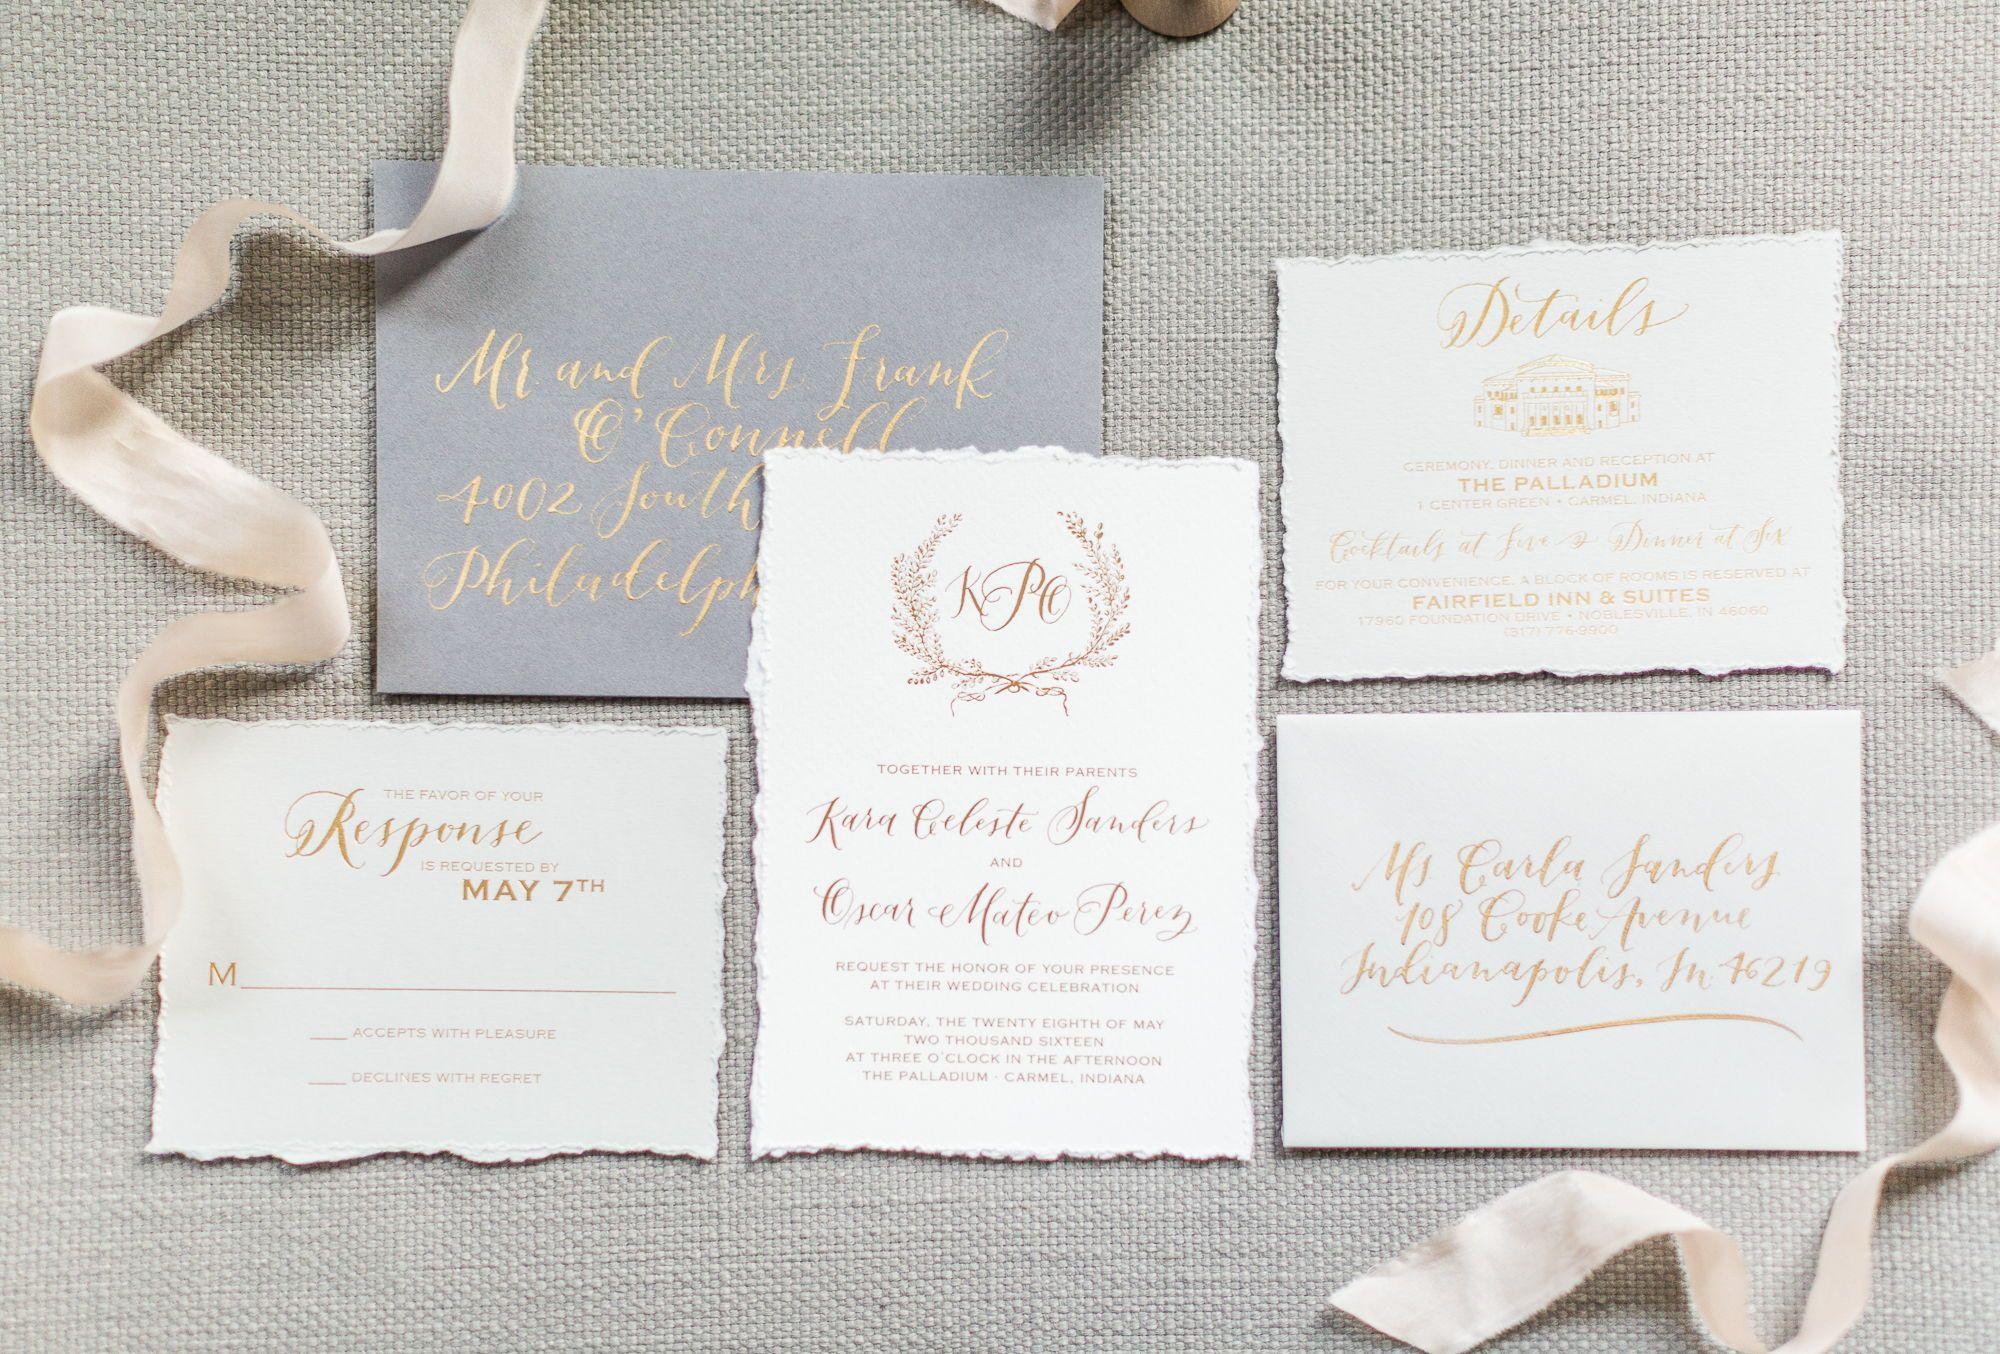 Deckle Edge Hand Made Paper Hand Torn Foil Stamping Calligraphy Custom Wedding Invit Wedding Inspiration Shoot Fine Art Wedding Script Wedding Invitations